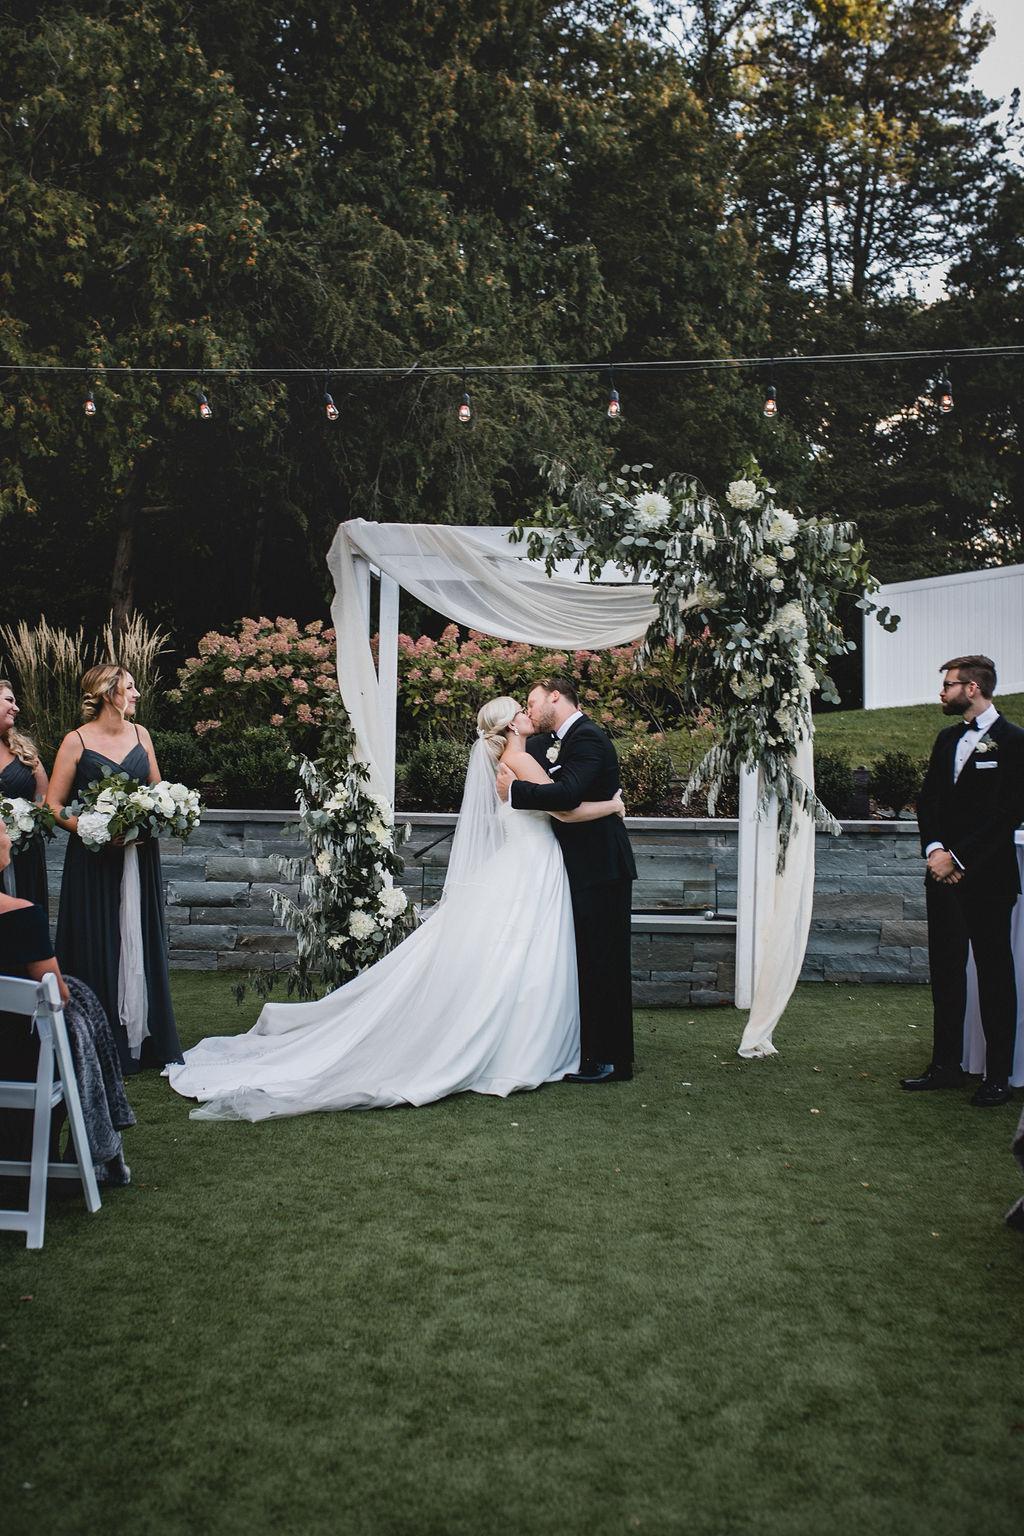 Kelly and Matt | Hutton House | Aqua Fox Photography | Sixpence Events and Planning Minnesota Wedding Planner91.jpg